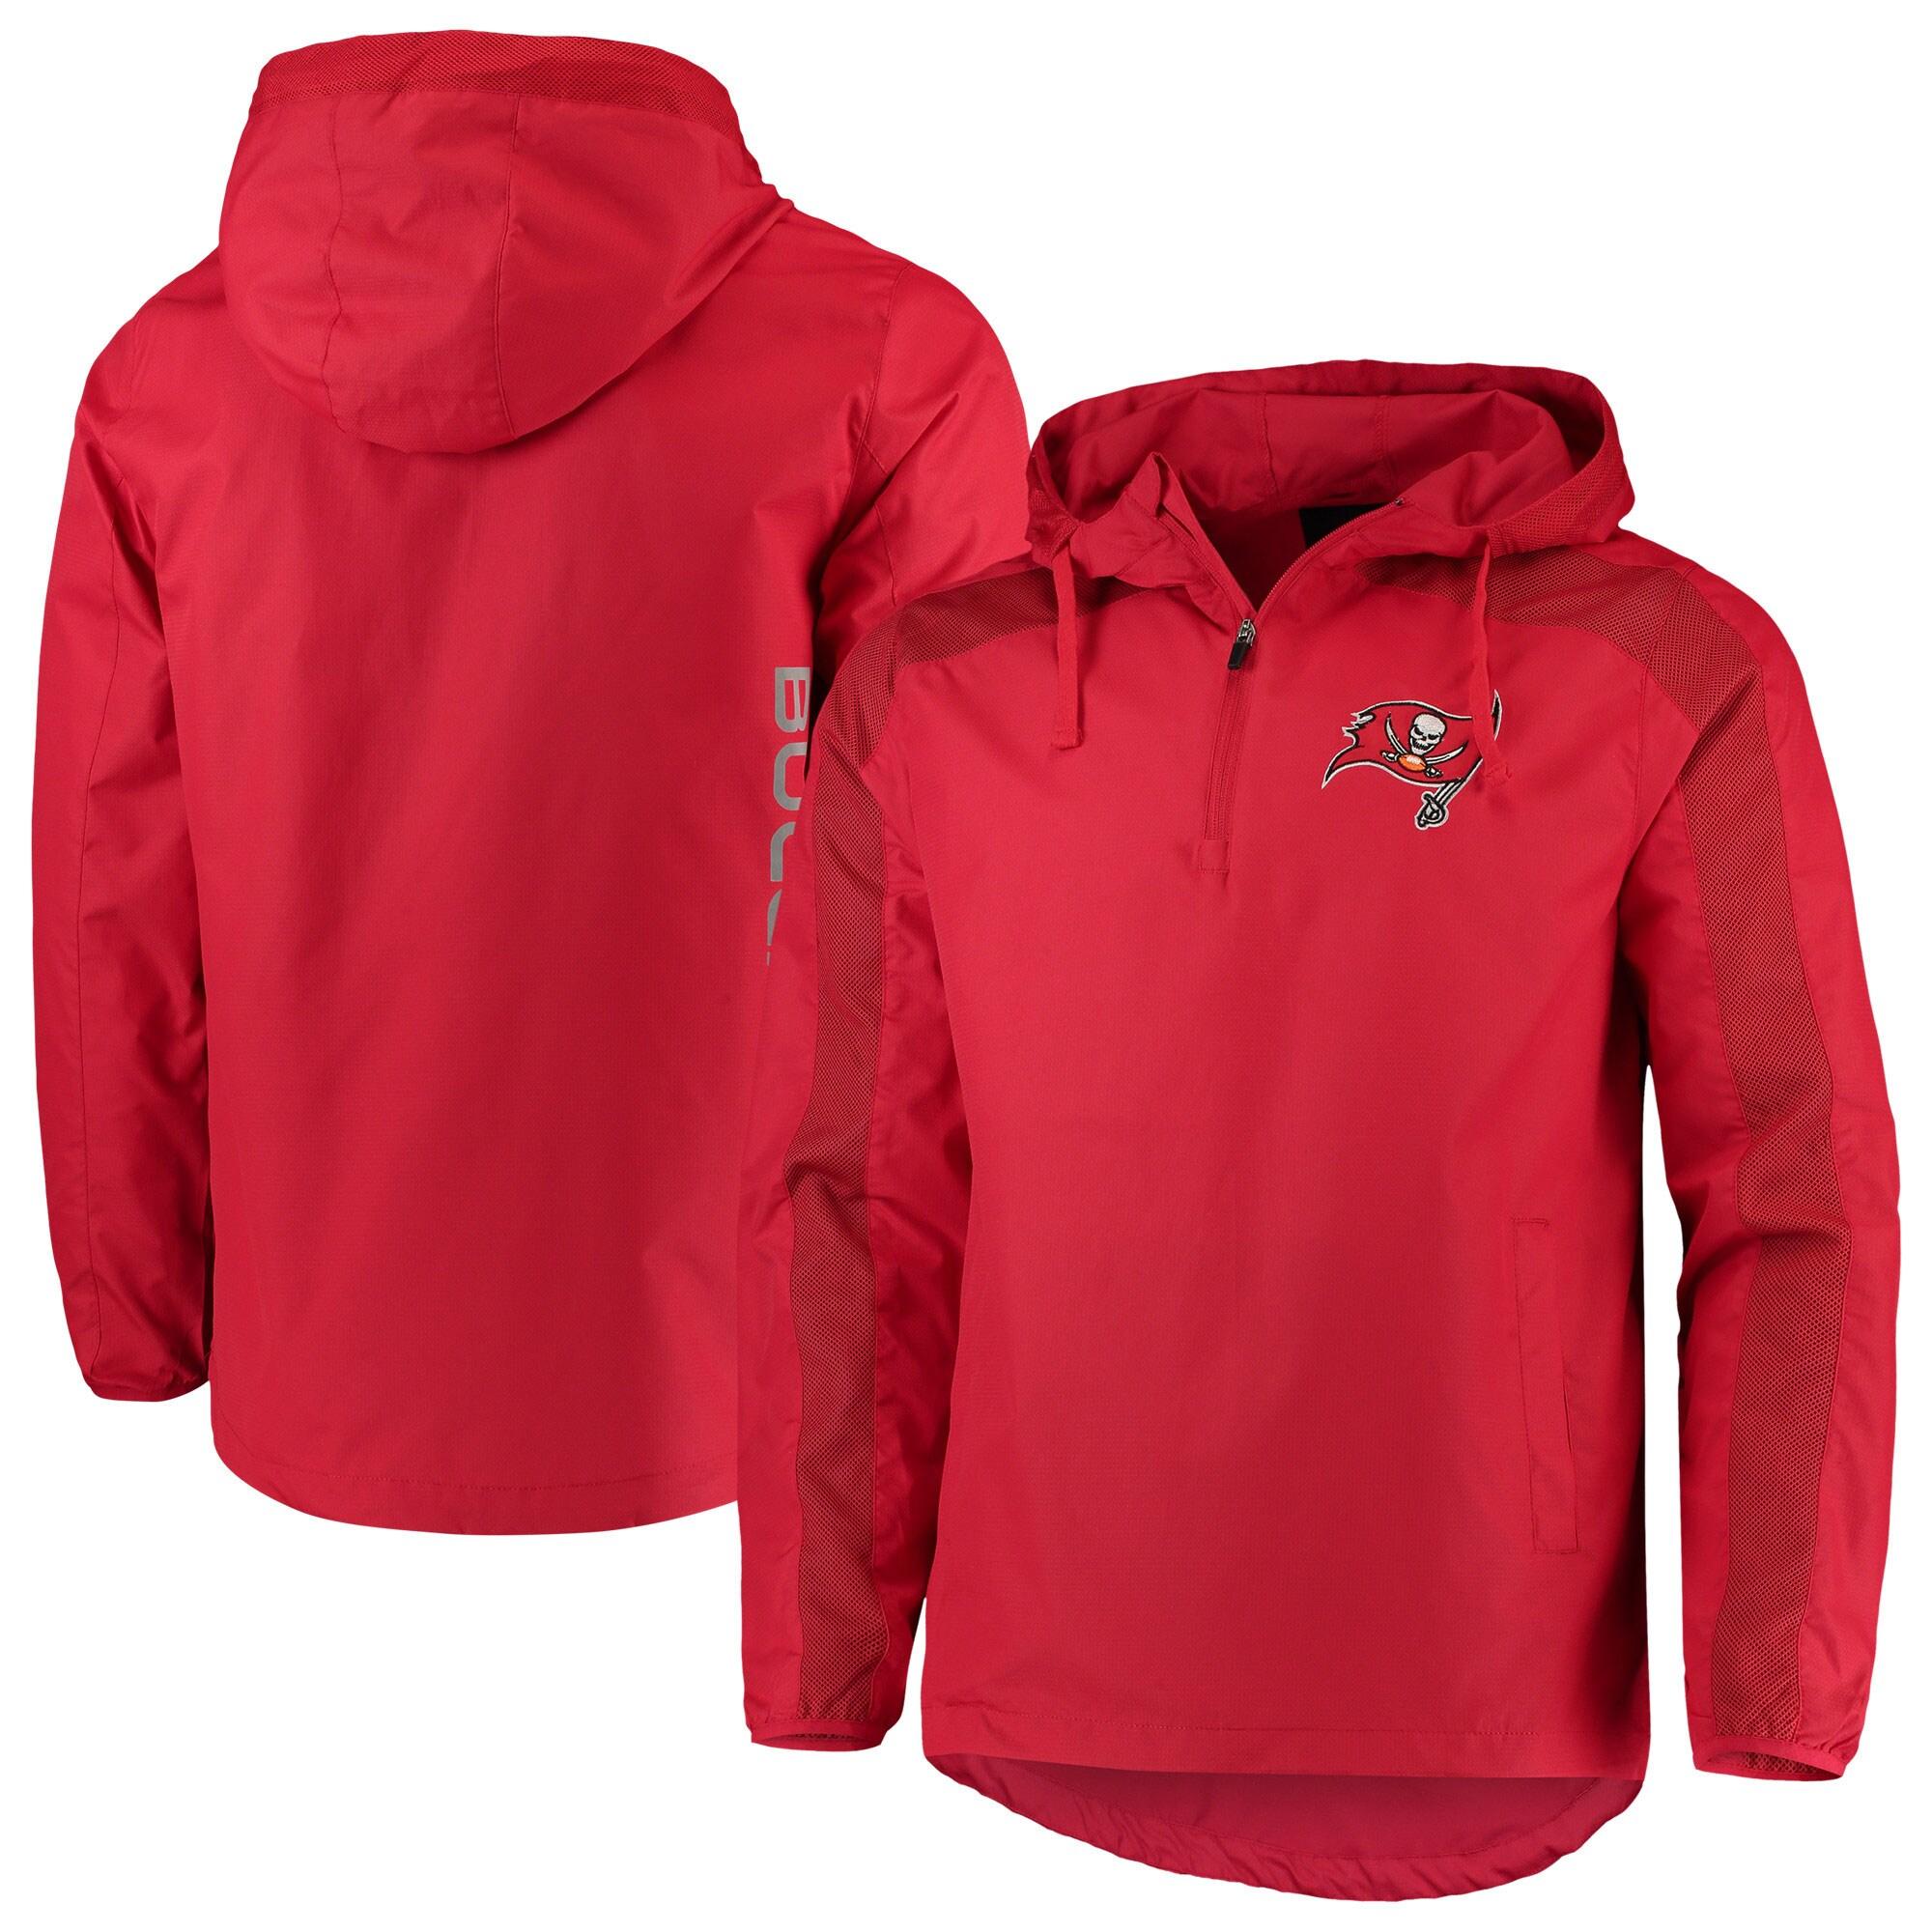 Tampa Bay Buccaneers G-III Sports by Carl Banks Lineup Hooded Half-Zip Jacket - Red